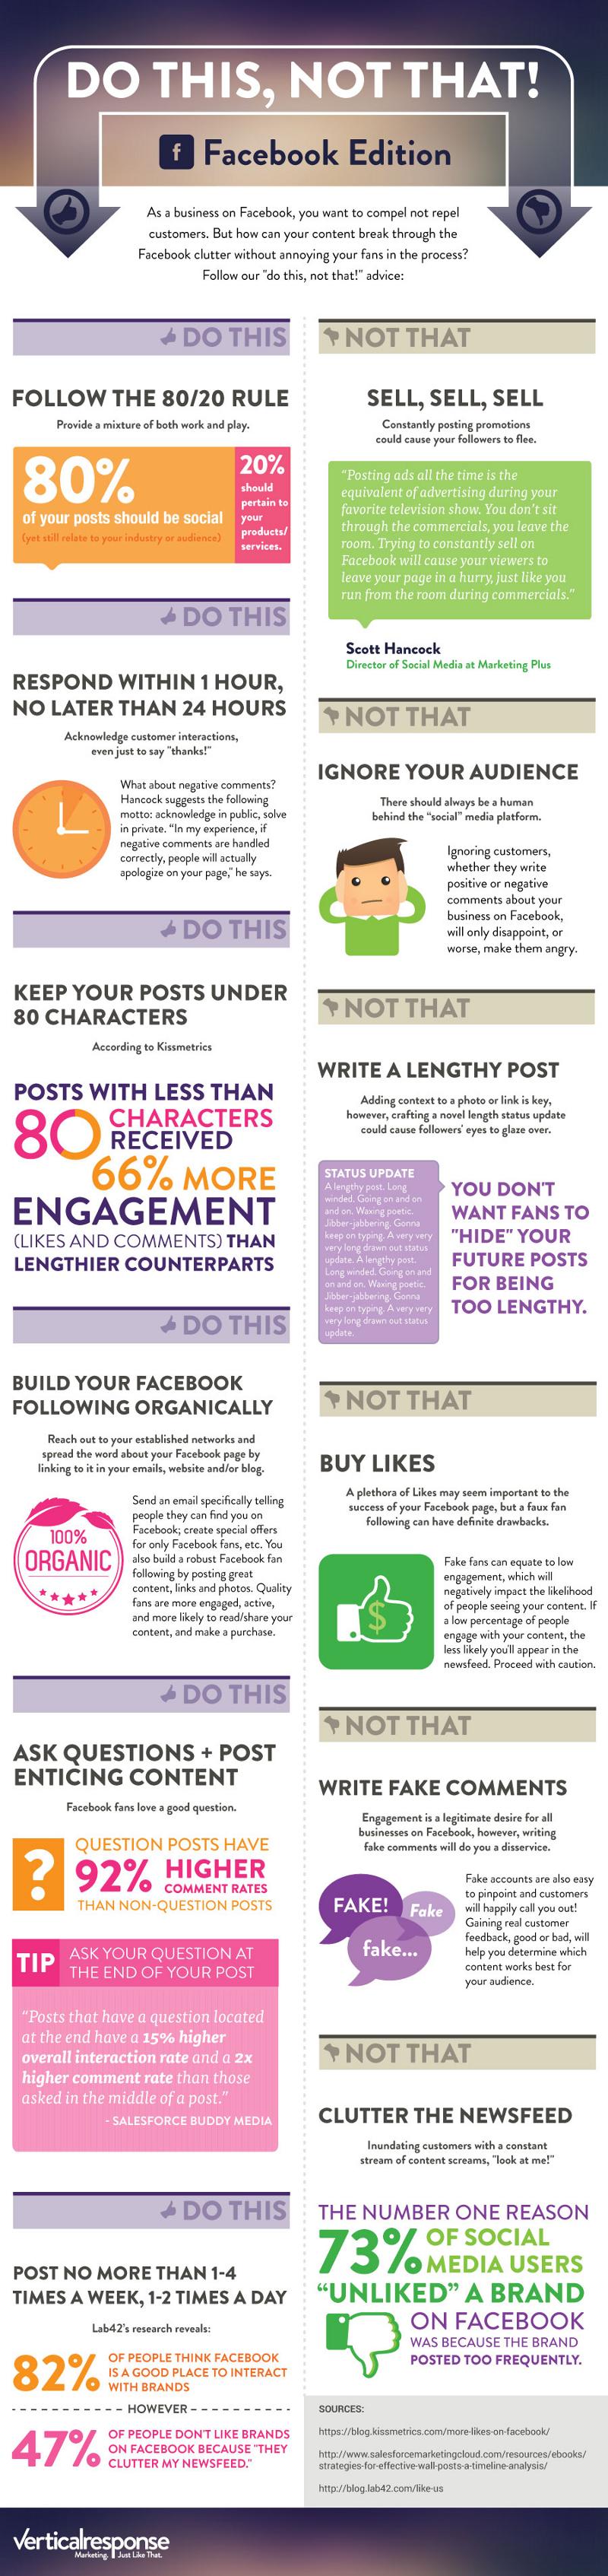 Facebook-Page-Management